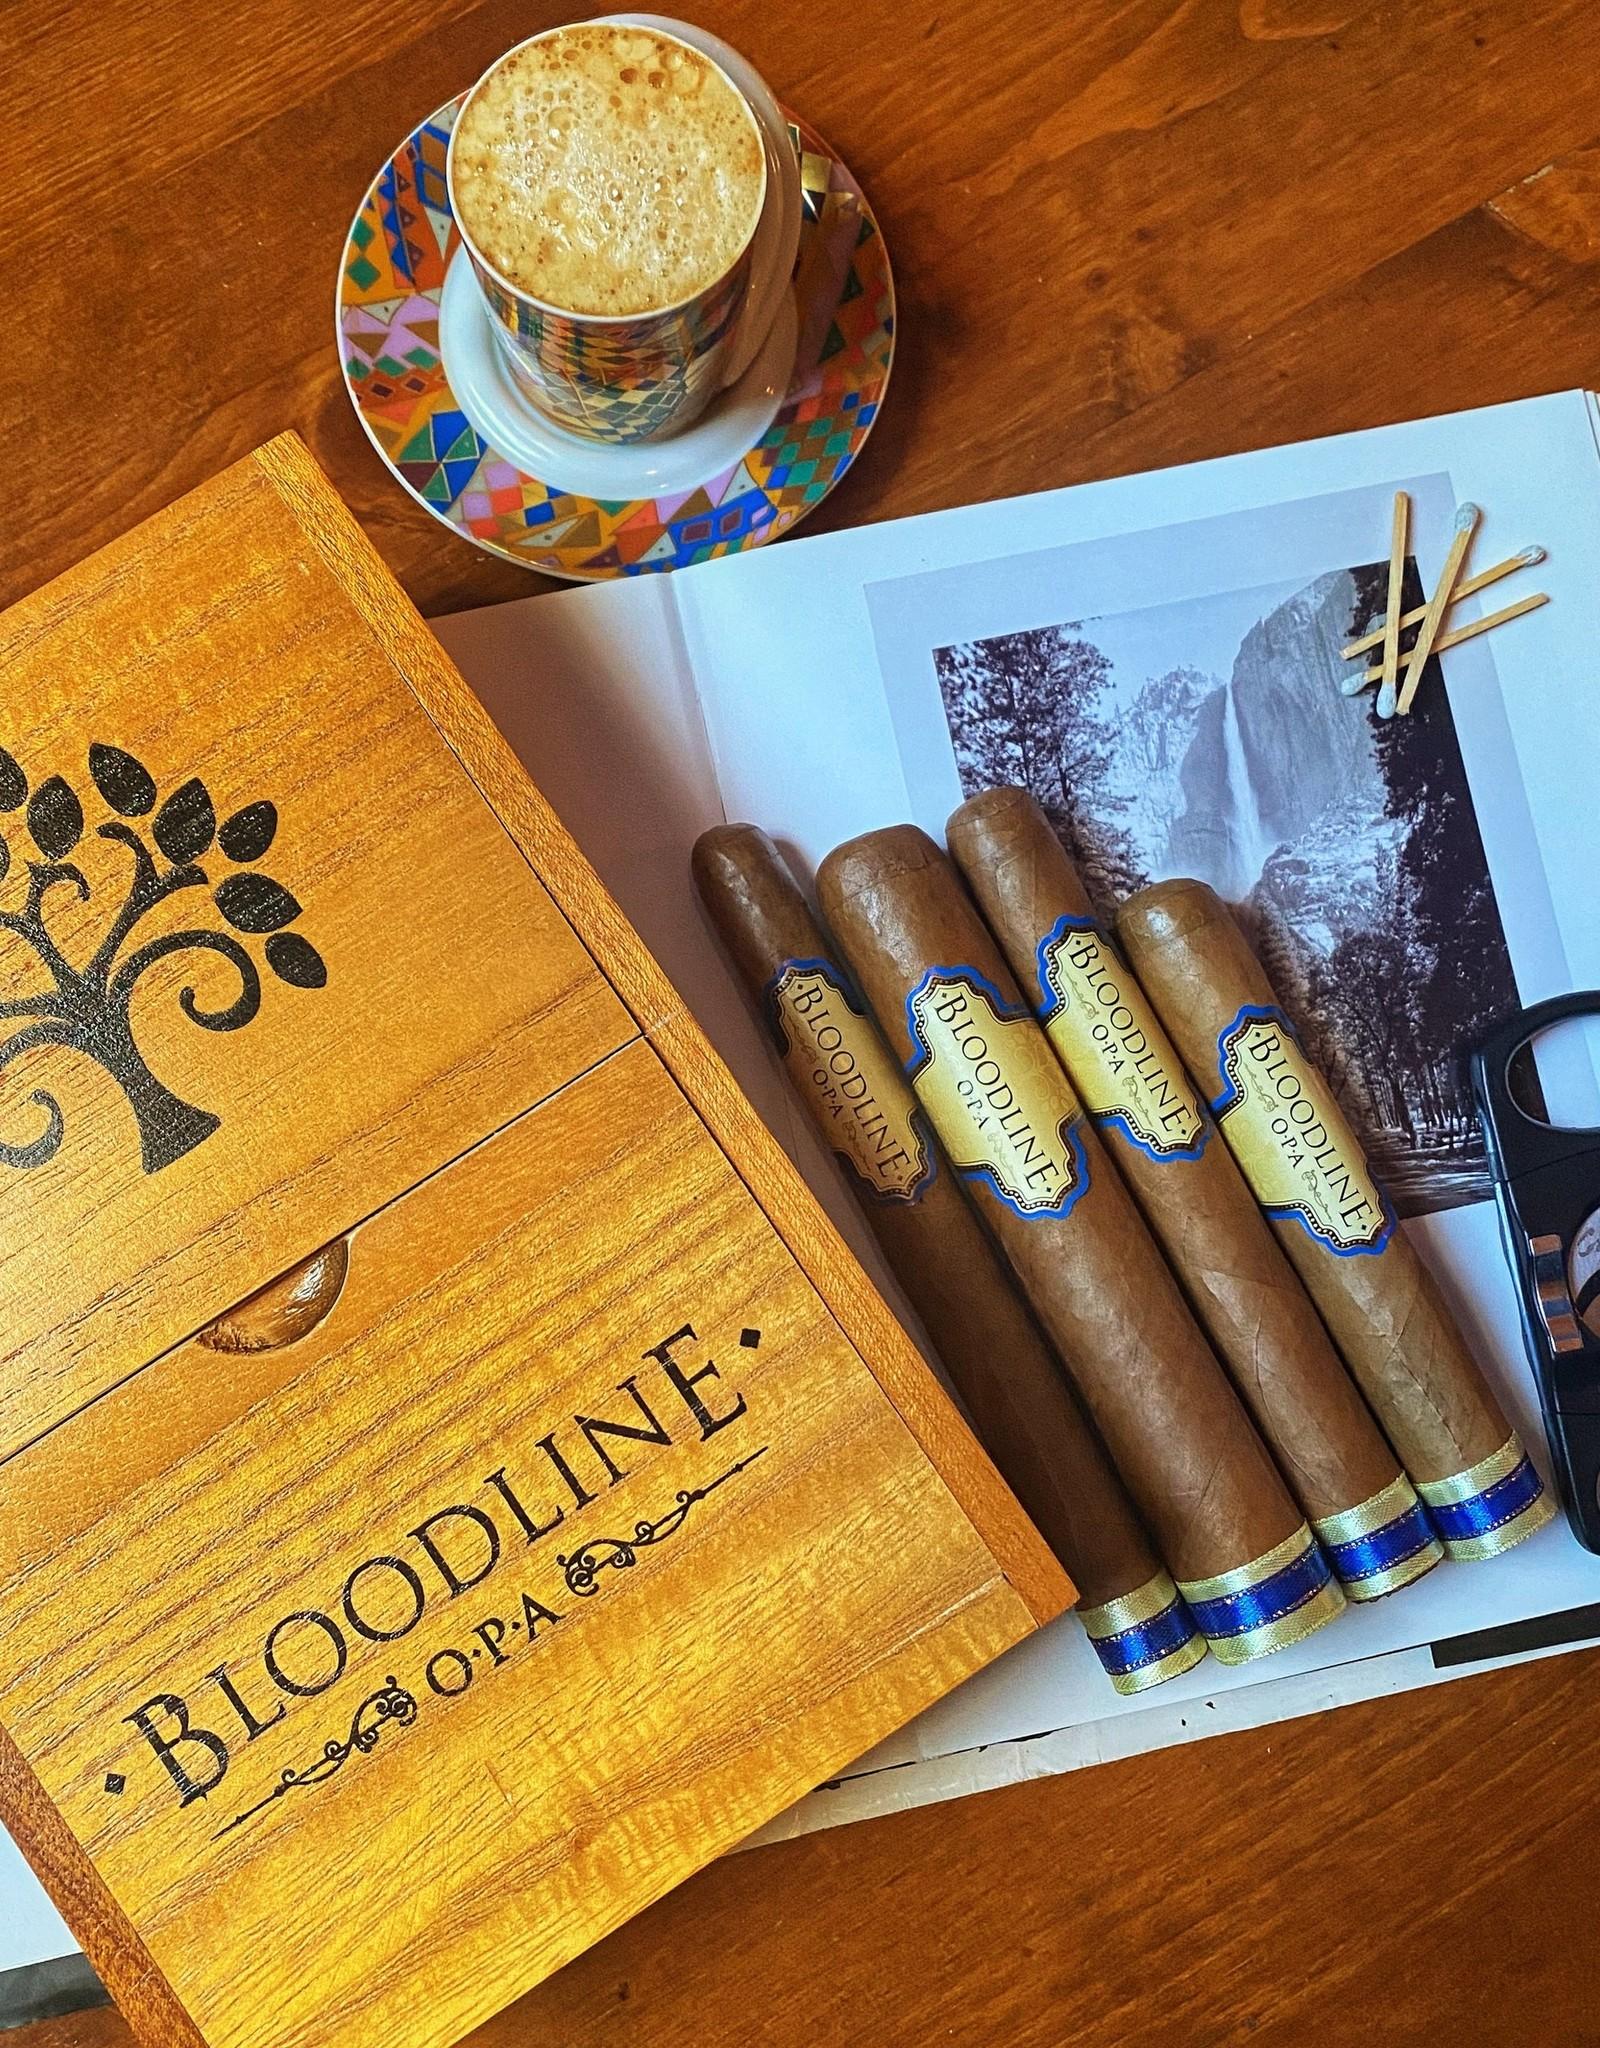 Bloodline OPA Bloodline OPA Blonde Toro 6 x 50 Box of 20